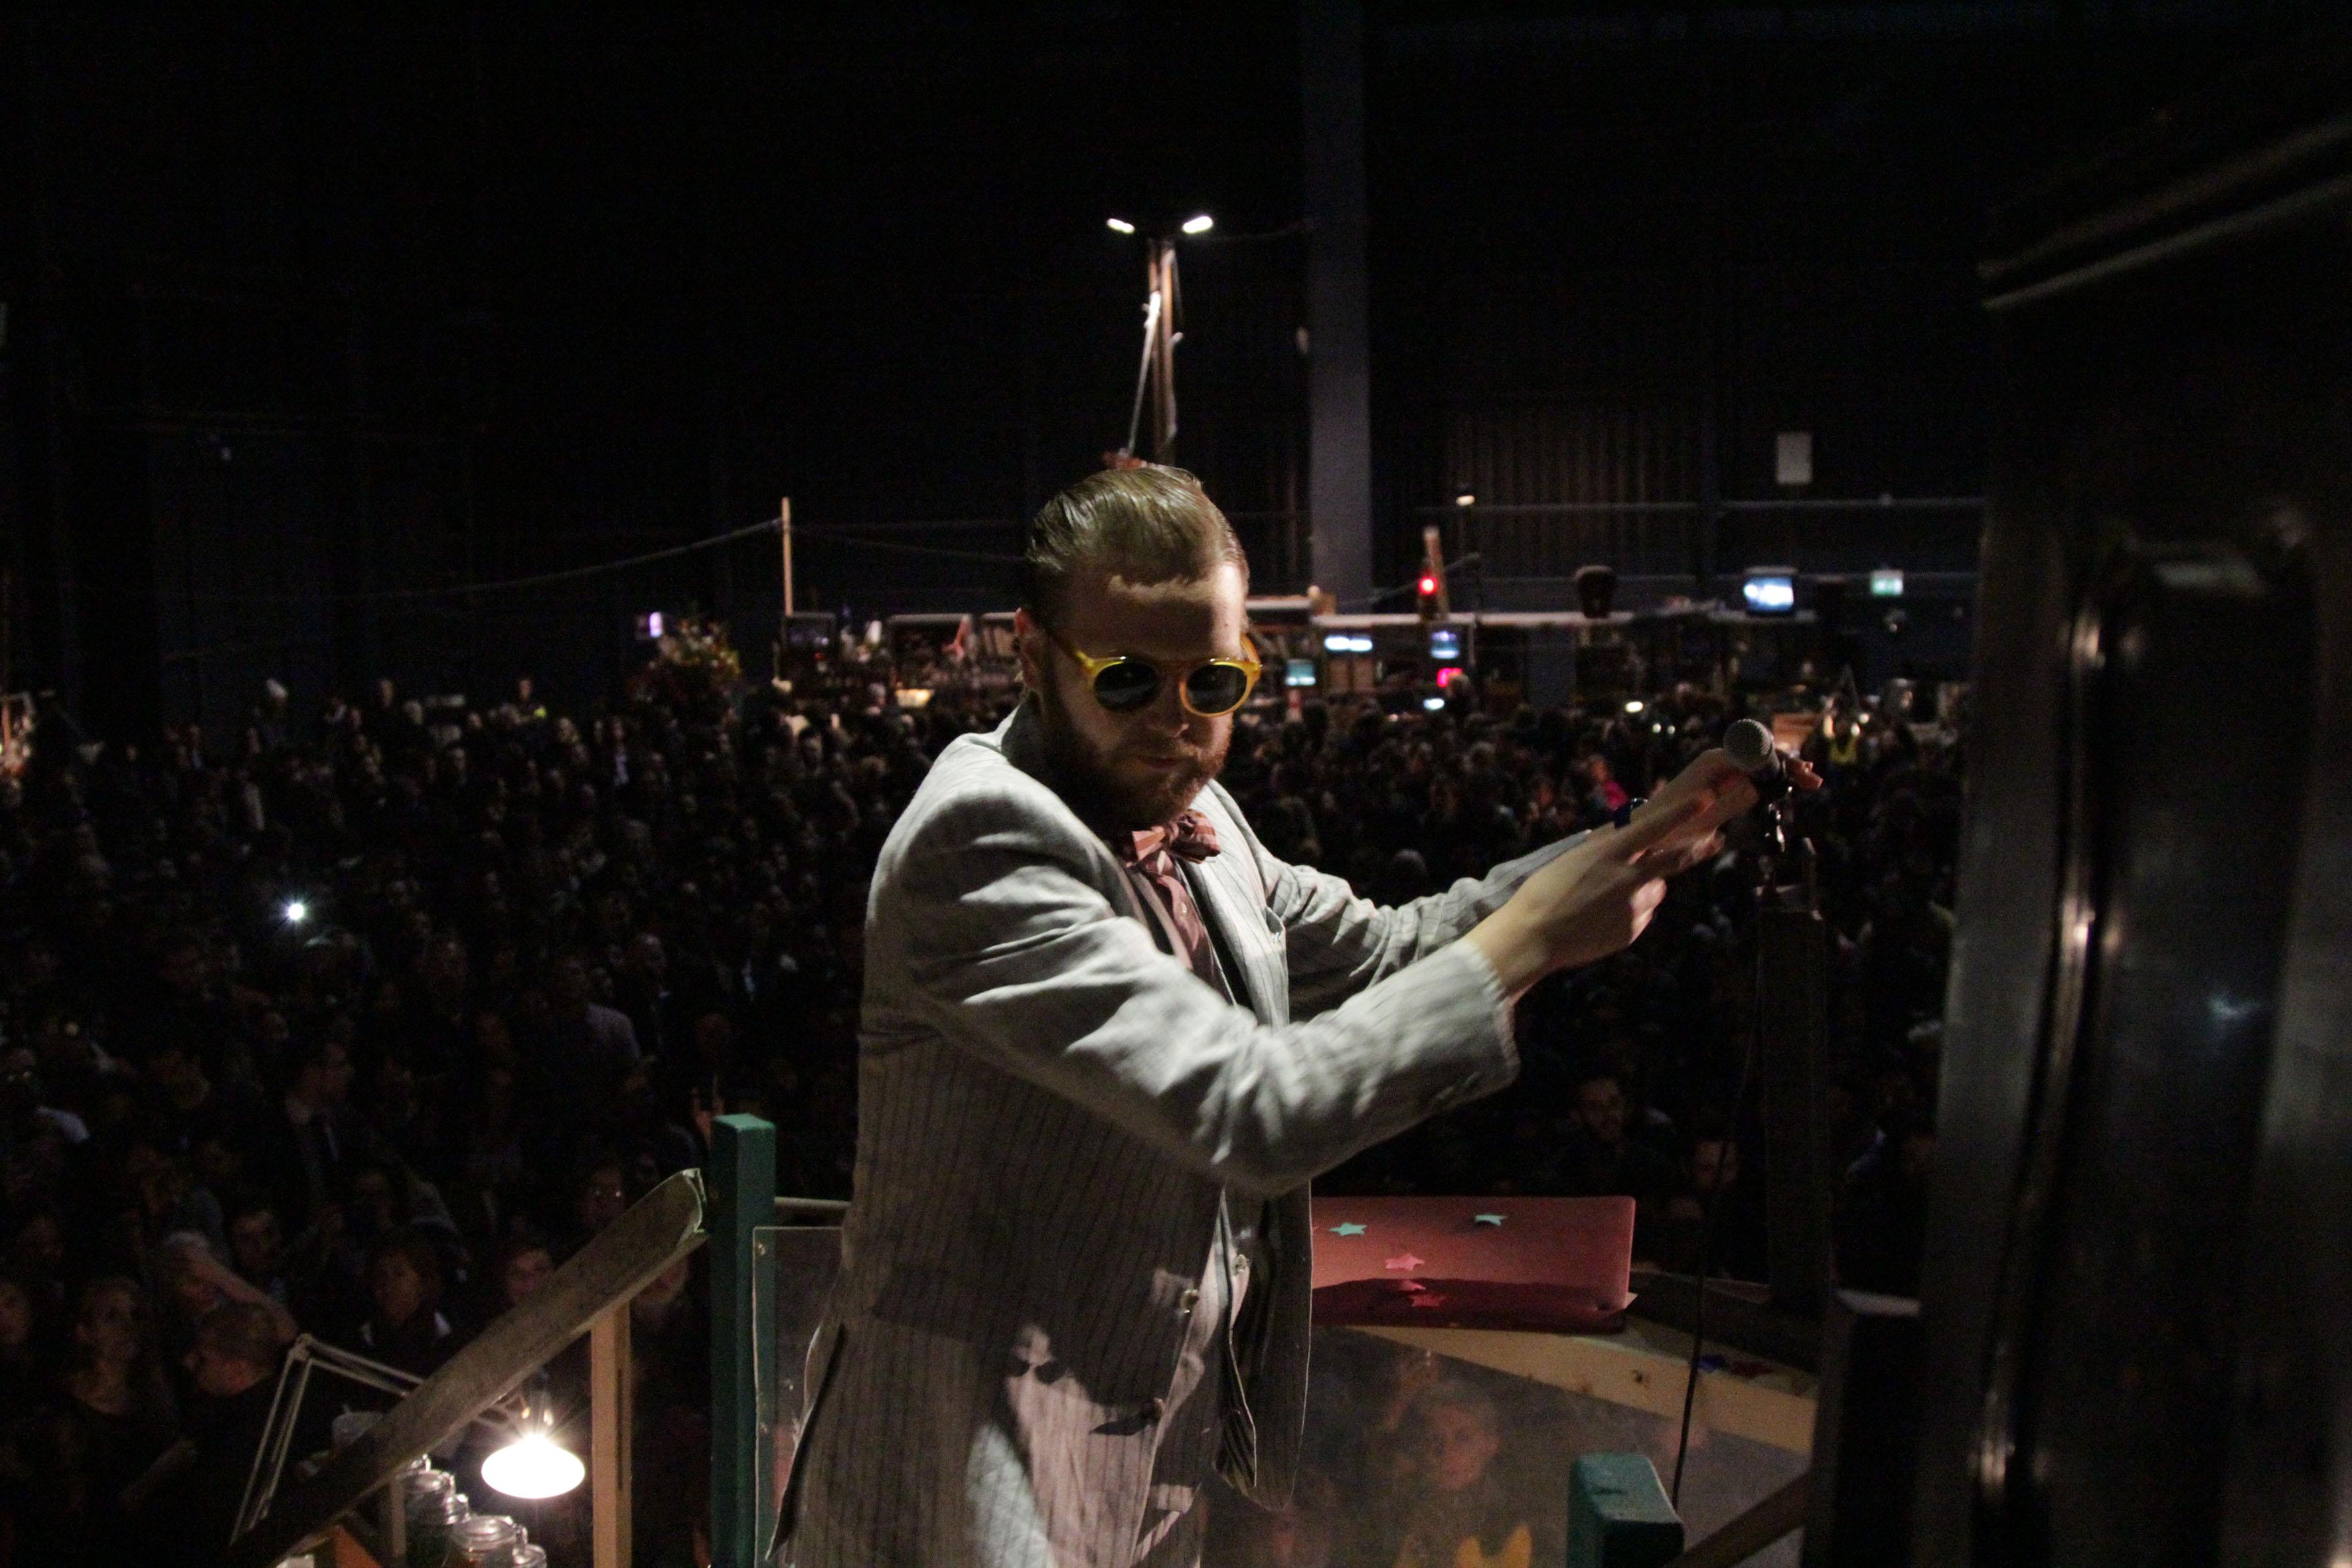 Ragnar Kjartansson, Davíð Þor Jónsson e Oddur Roth, An Evening of Country and Western, Pirelli HangarBicocca, Milano, 2013. Courtesy Pirelli HangarBicocca, Milano.